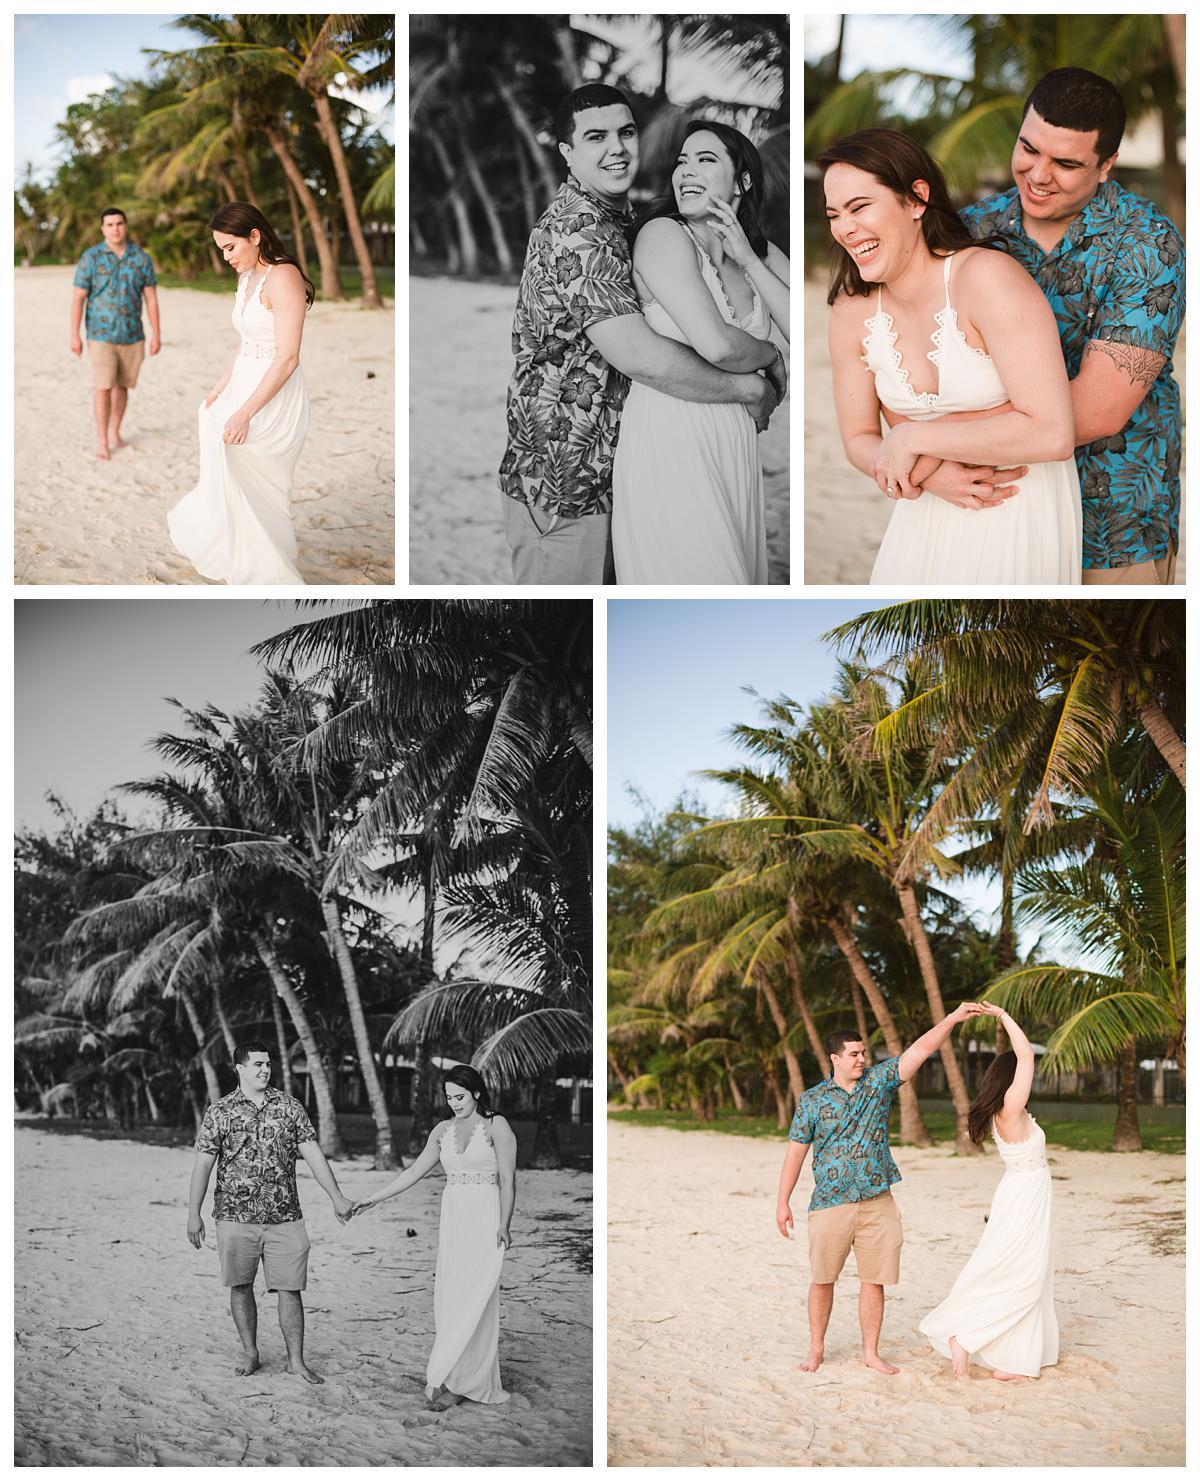 21PX_Guam_Photographers_Engagement Session_0010.jpg